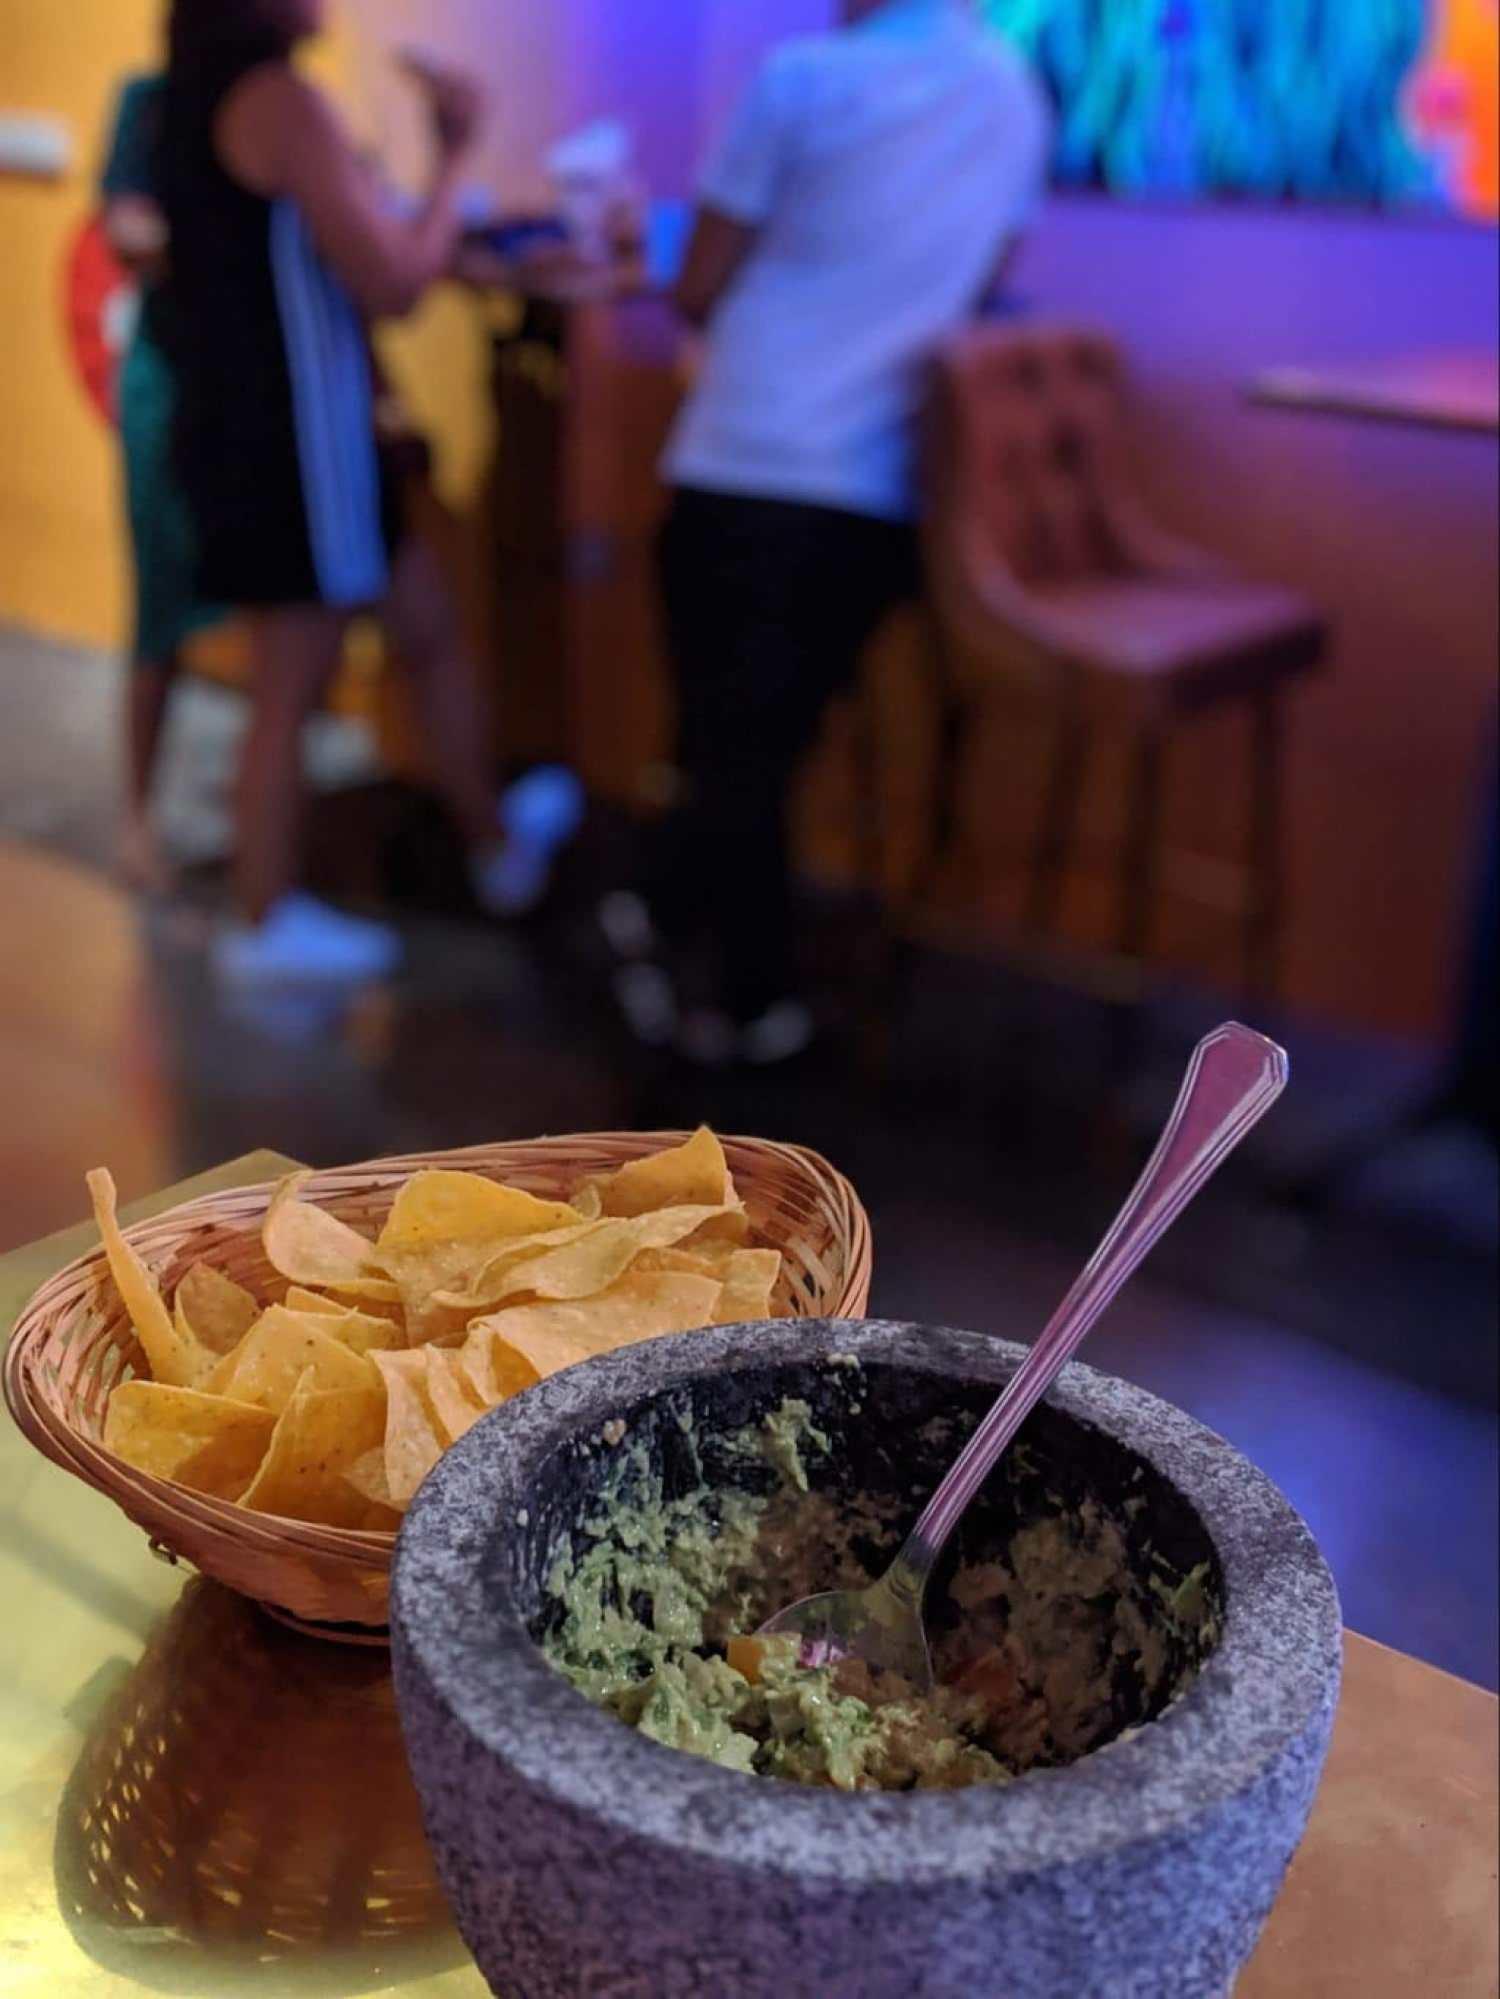 Guacamole is my favorite Mexican food